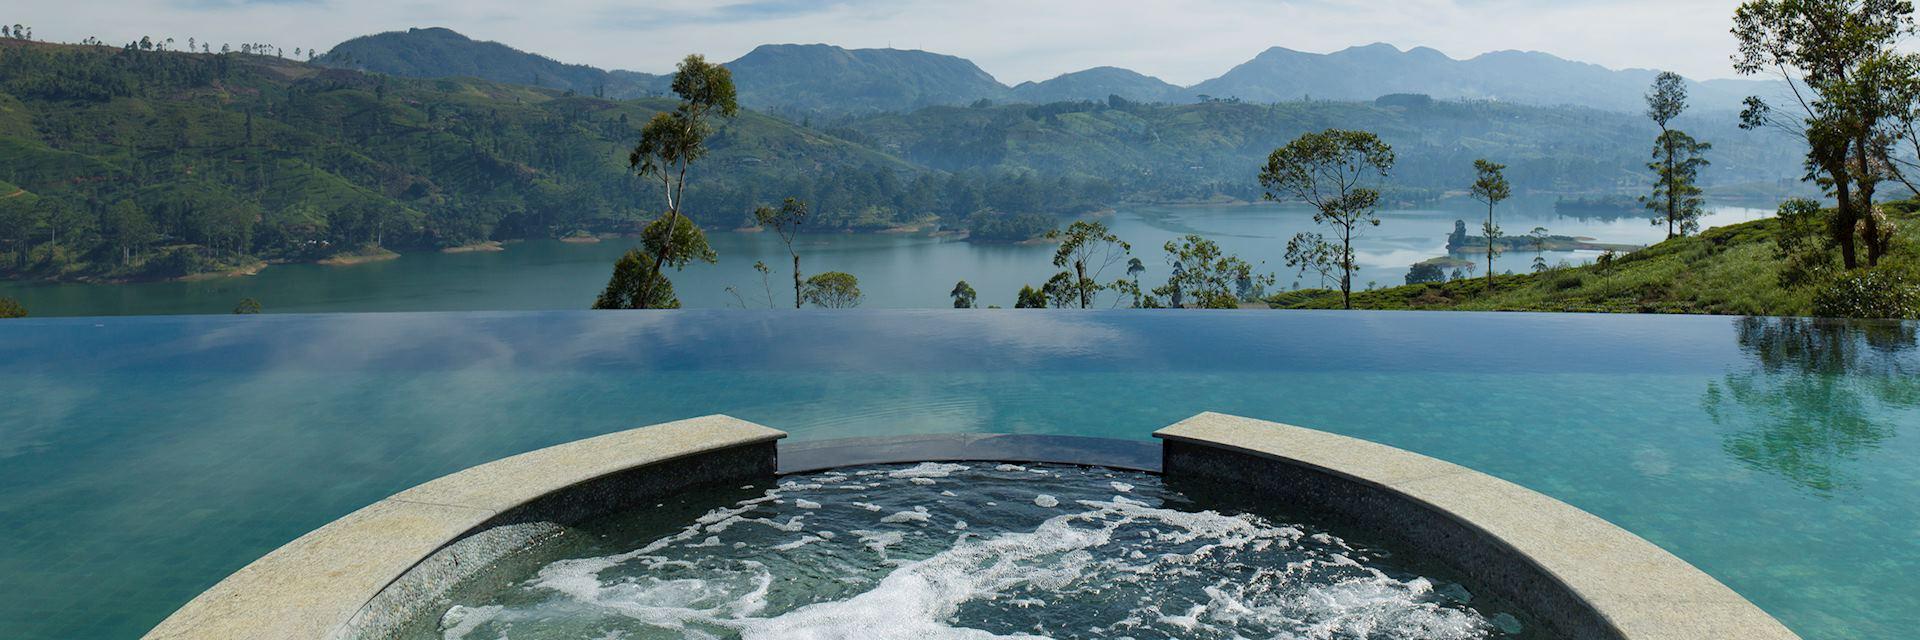 Dunkeld Bungalow, Ceylon Tea Trails